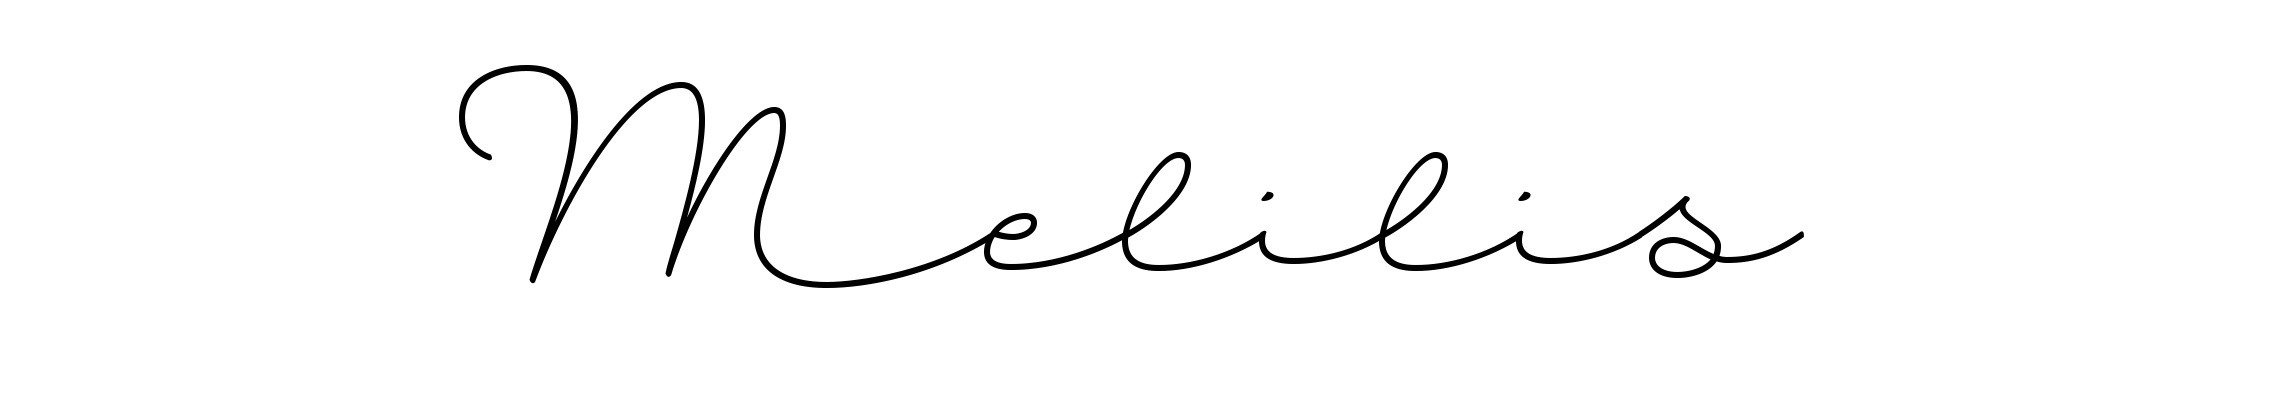 melilis